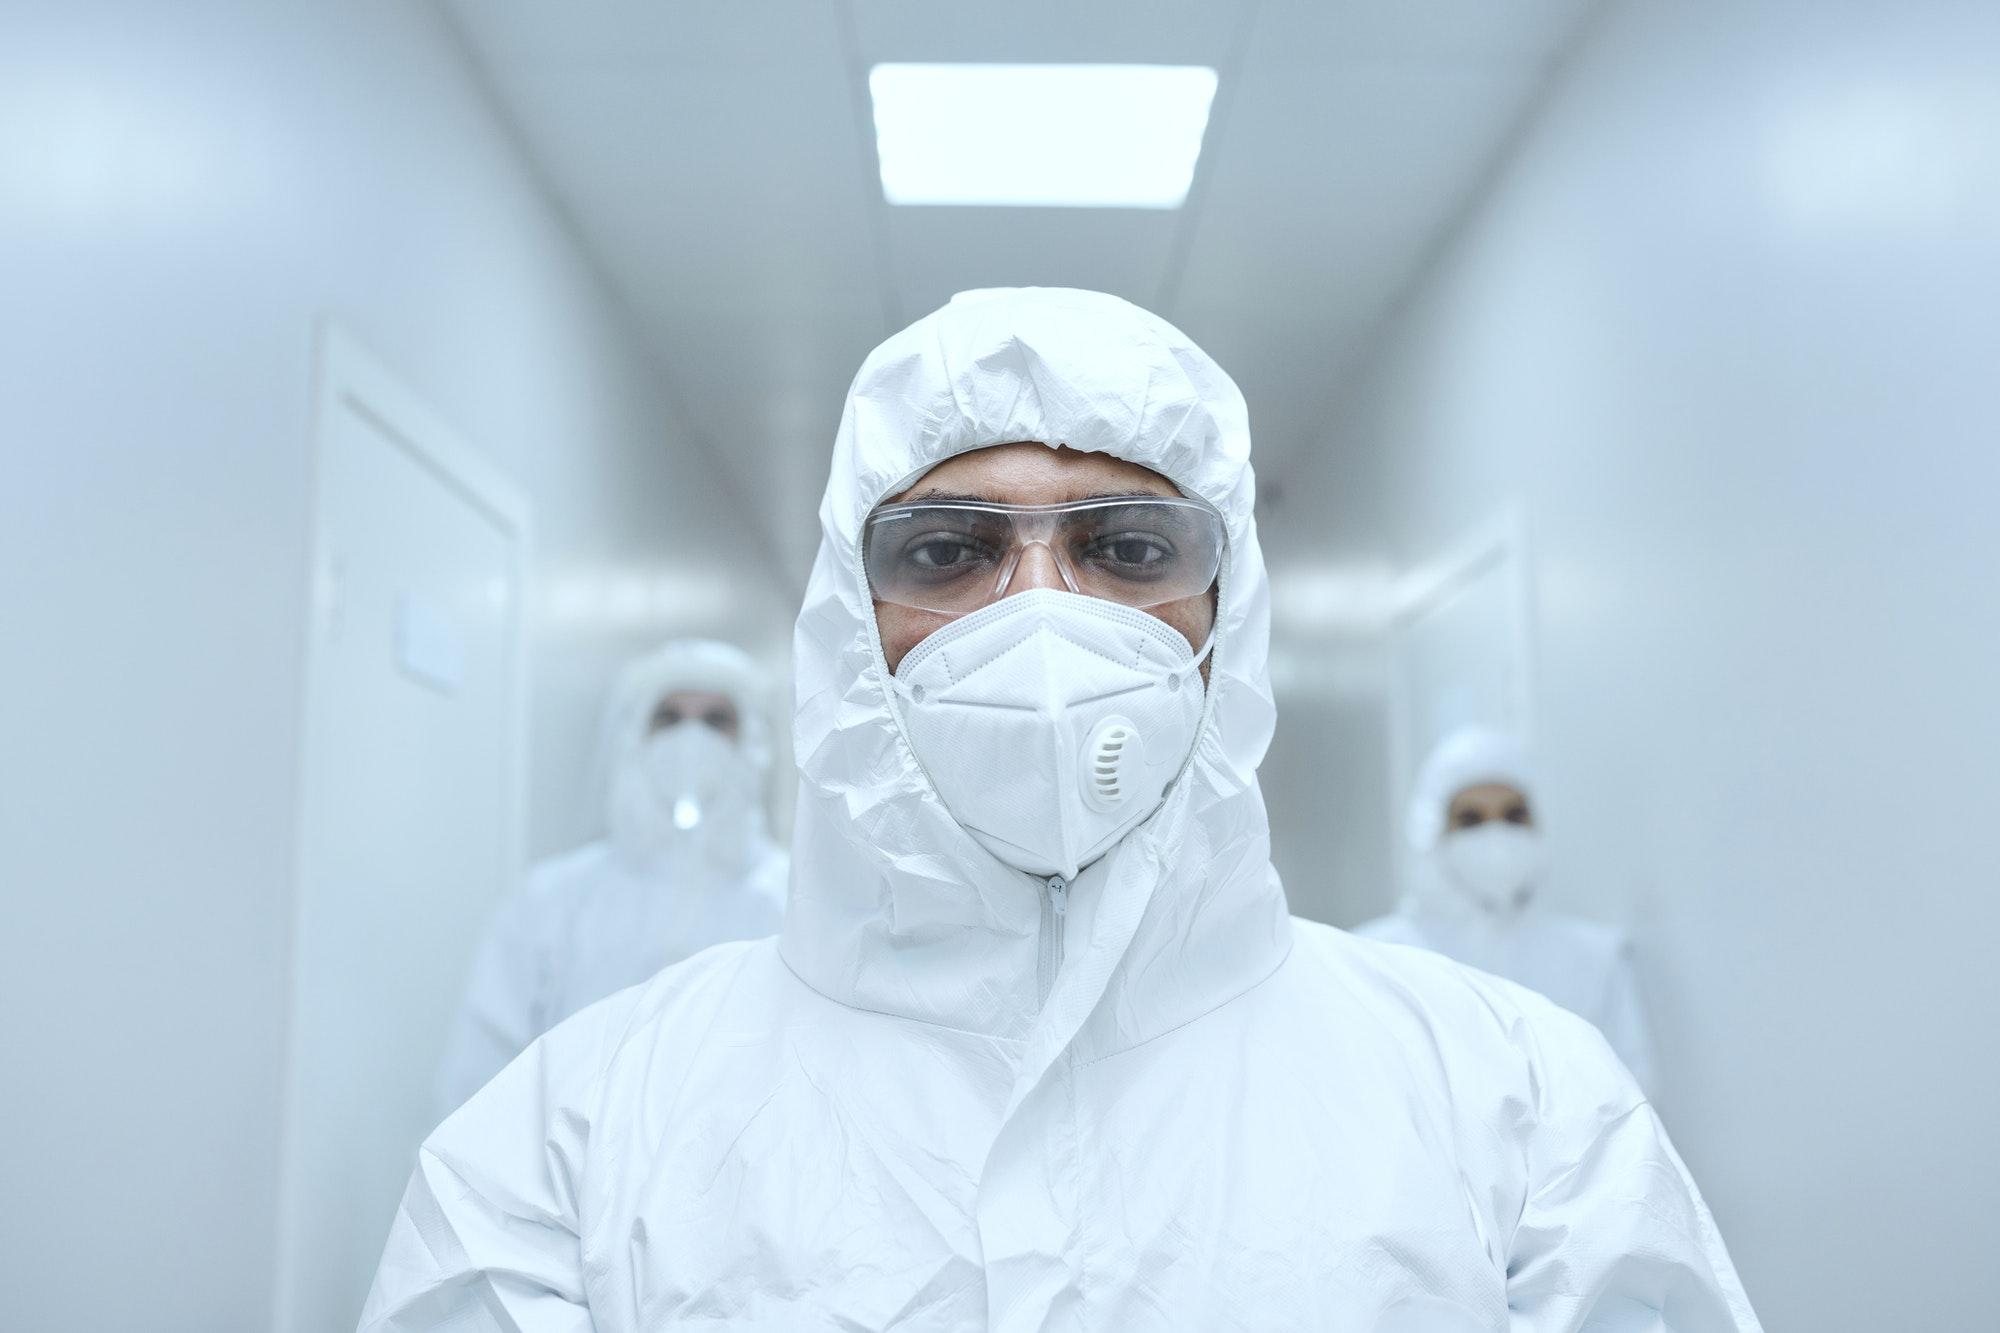 Coronavirus pandemic at hospital